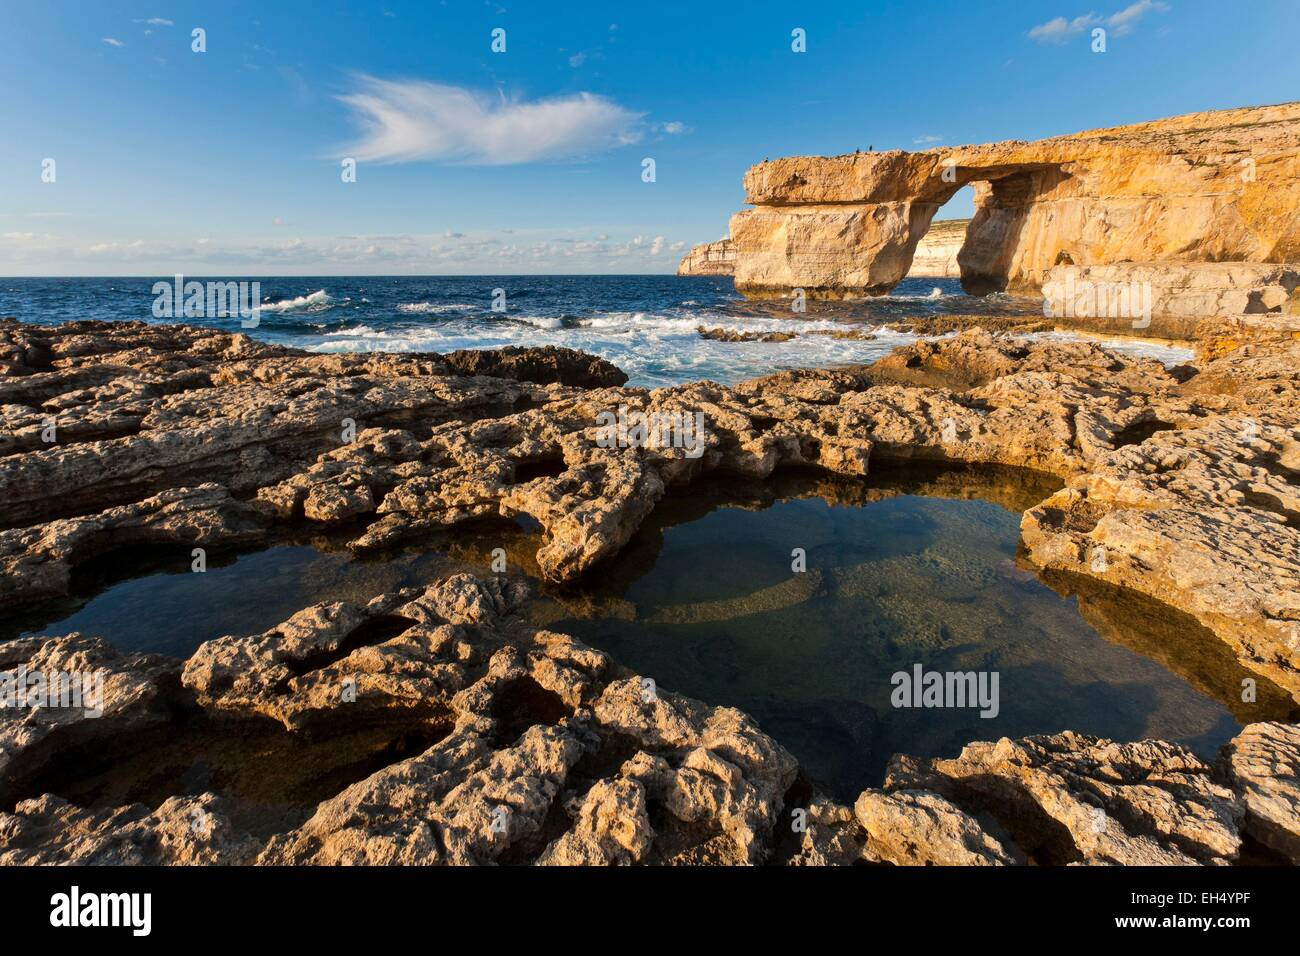 Malta, Gozo island, the natural arch of Azure Window Stock Photo